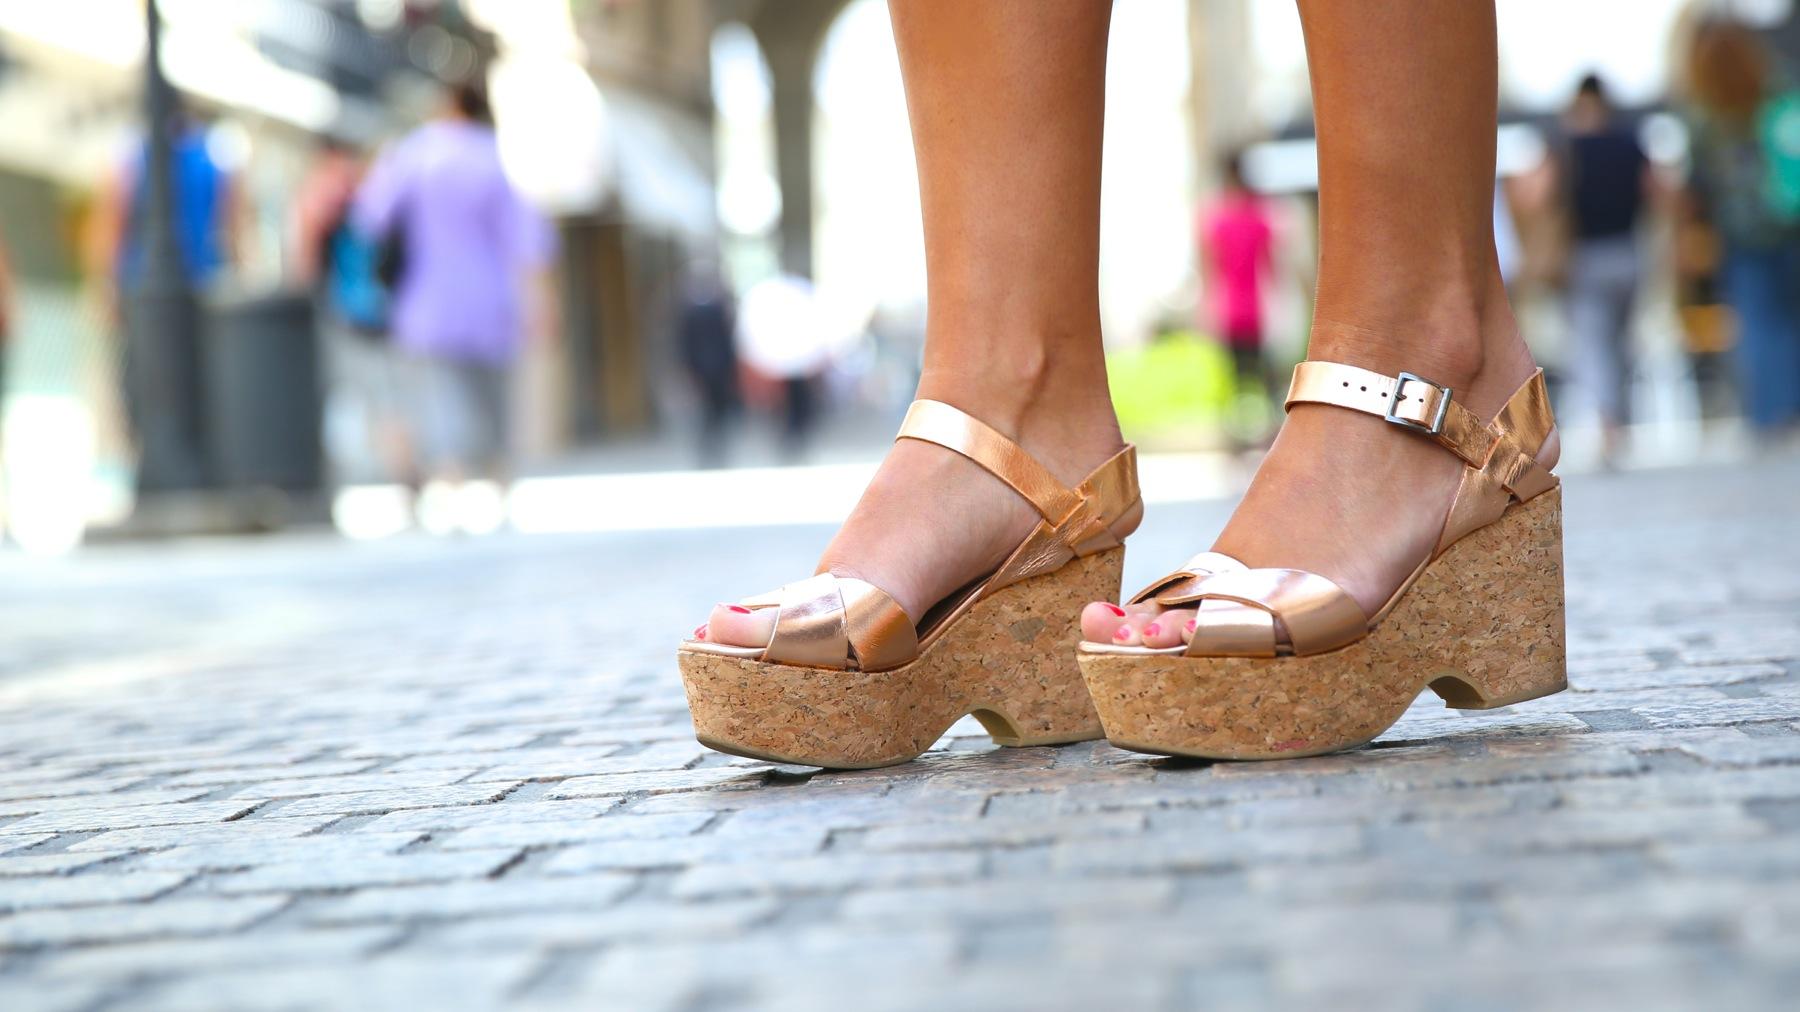 trendy_taste-look-outfit-street_style-ootd-blog-blogger-fashion_spain-moda_españa-mono-flores-flower_print-verano-summer-overall-la_coruña-1